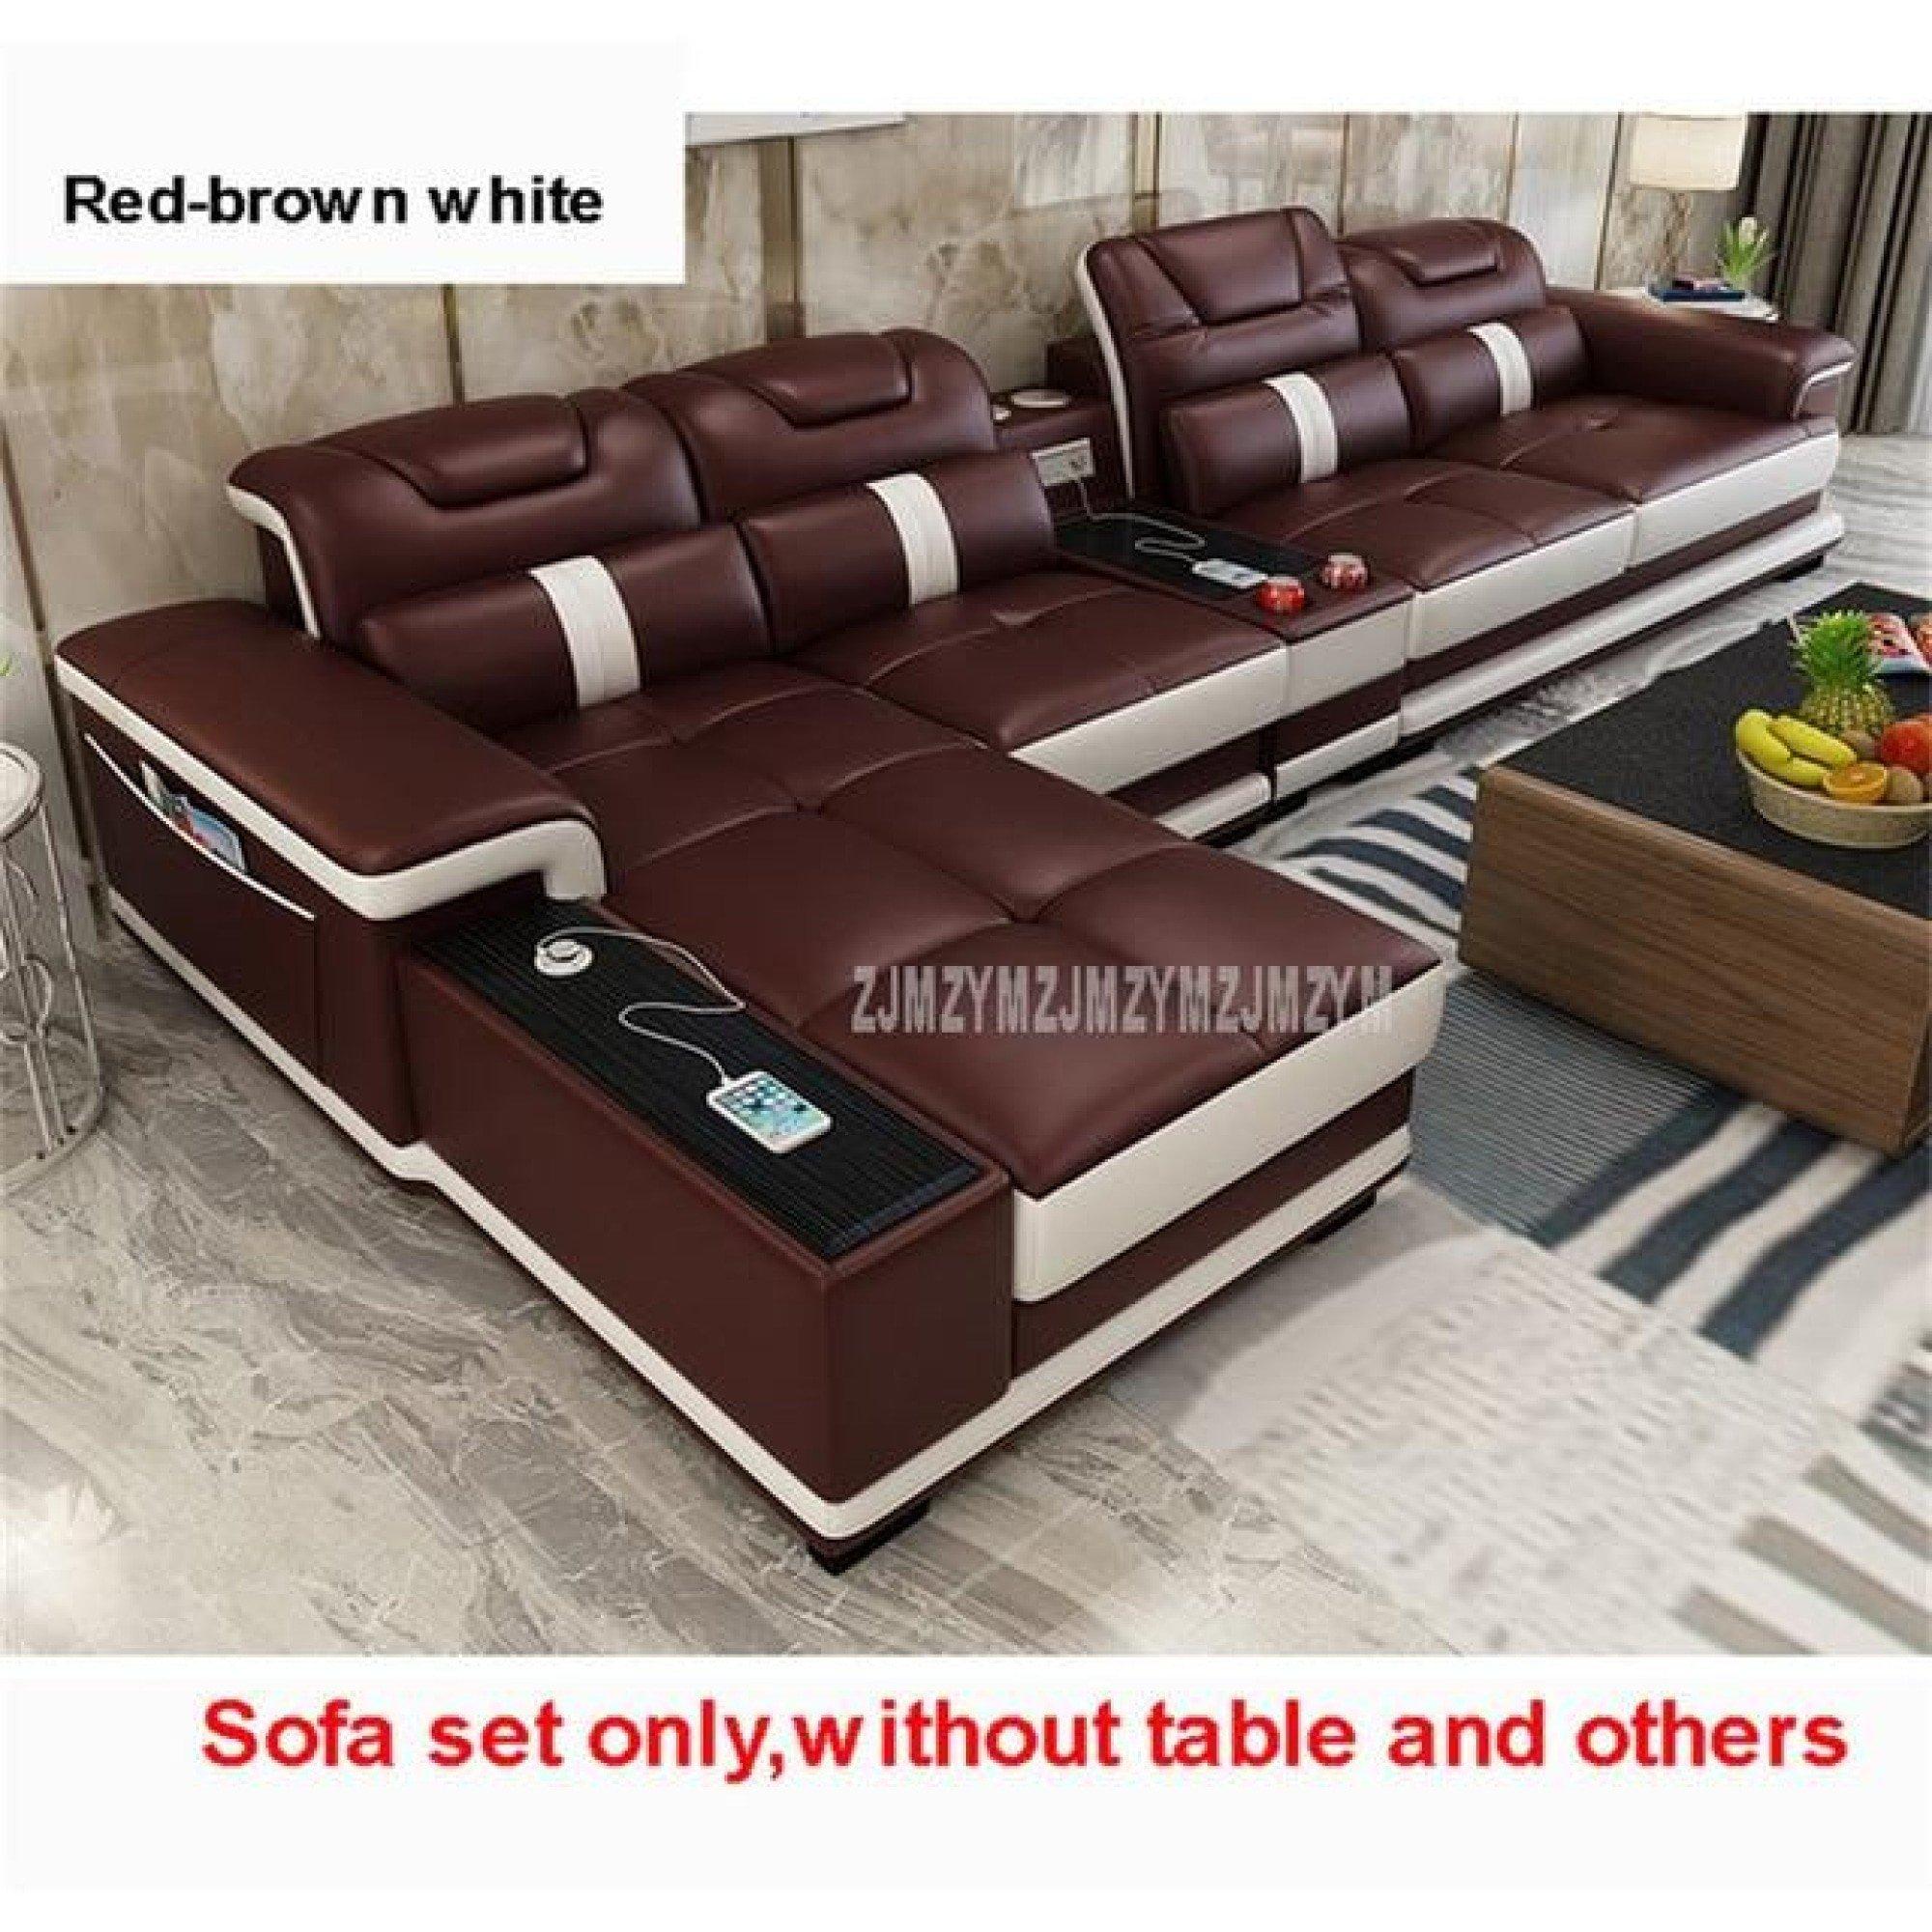 Elegant Electrical 4 Seater Leather Sofa Set Leather Sofa Living Room Living Room Leather Living Room Sofa Set